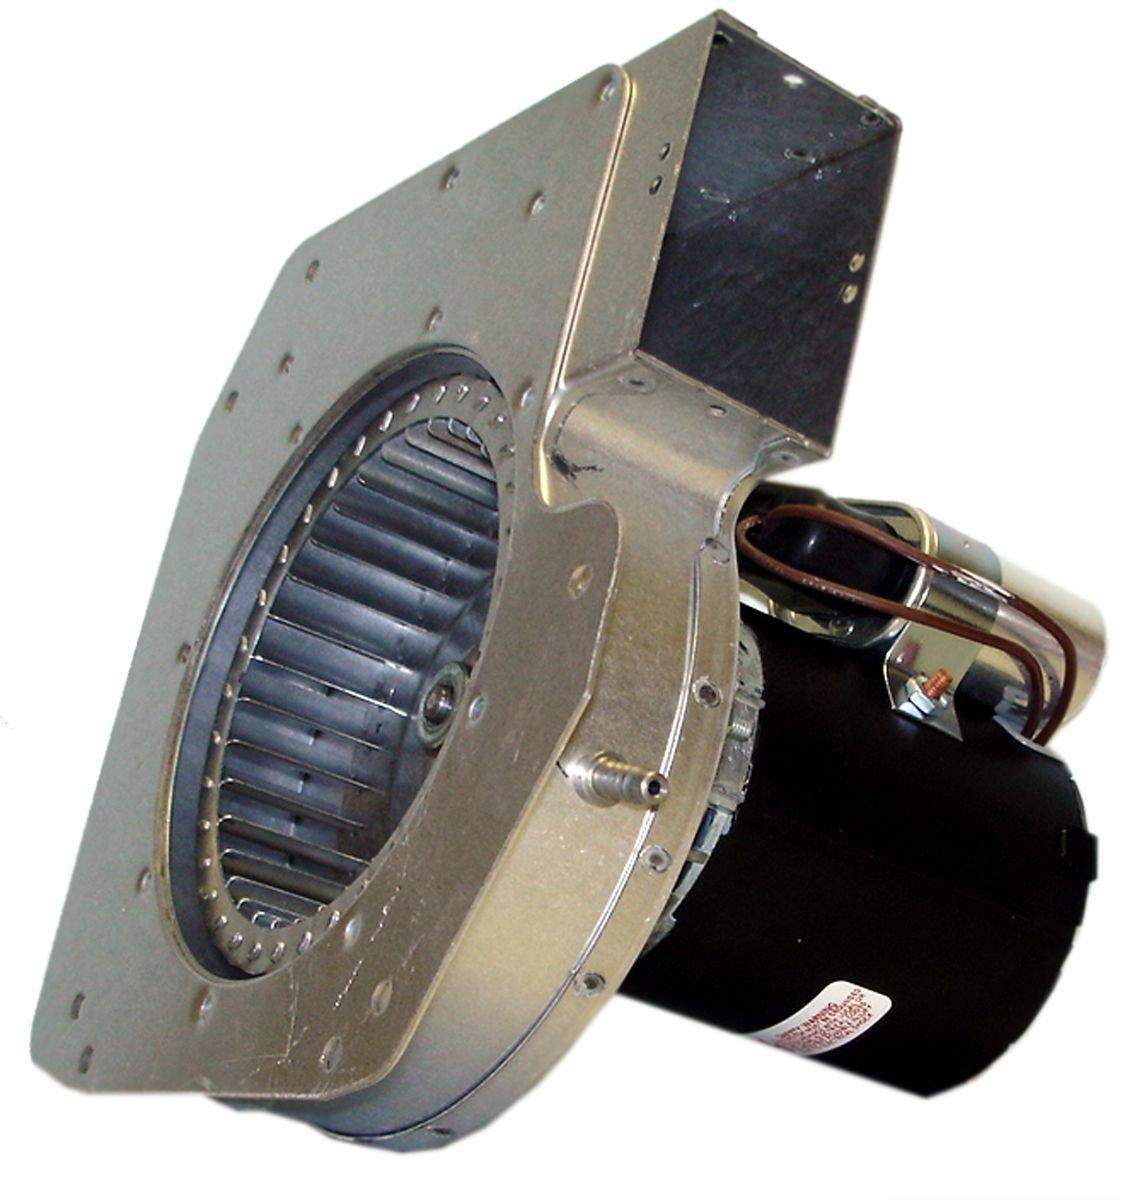 69M3301 7062-4083 7062-4517 Lennox 7062-5546 Fasco A330 Specific Purpose Blowers 7062-4608